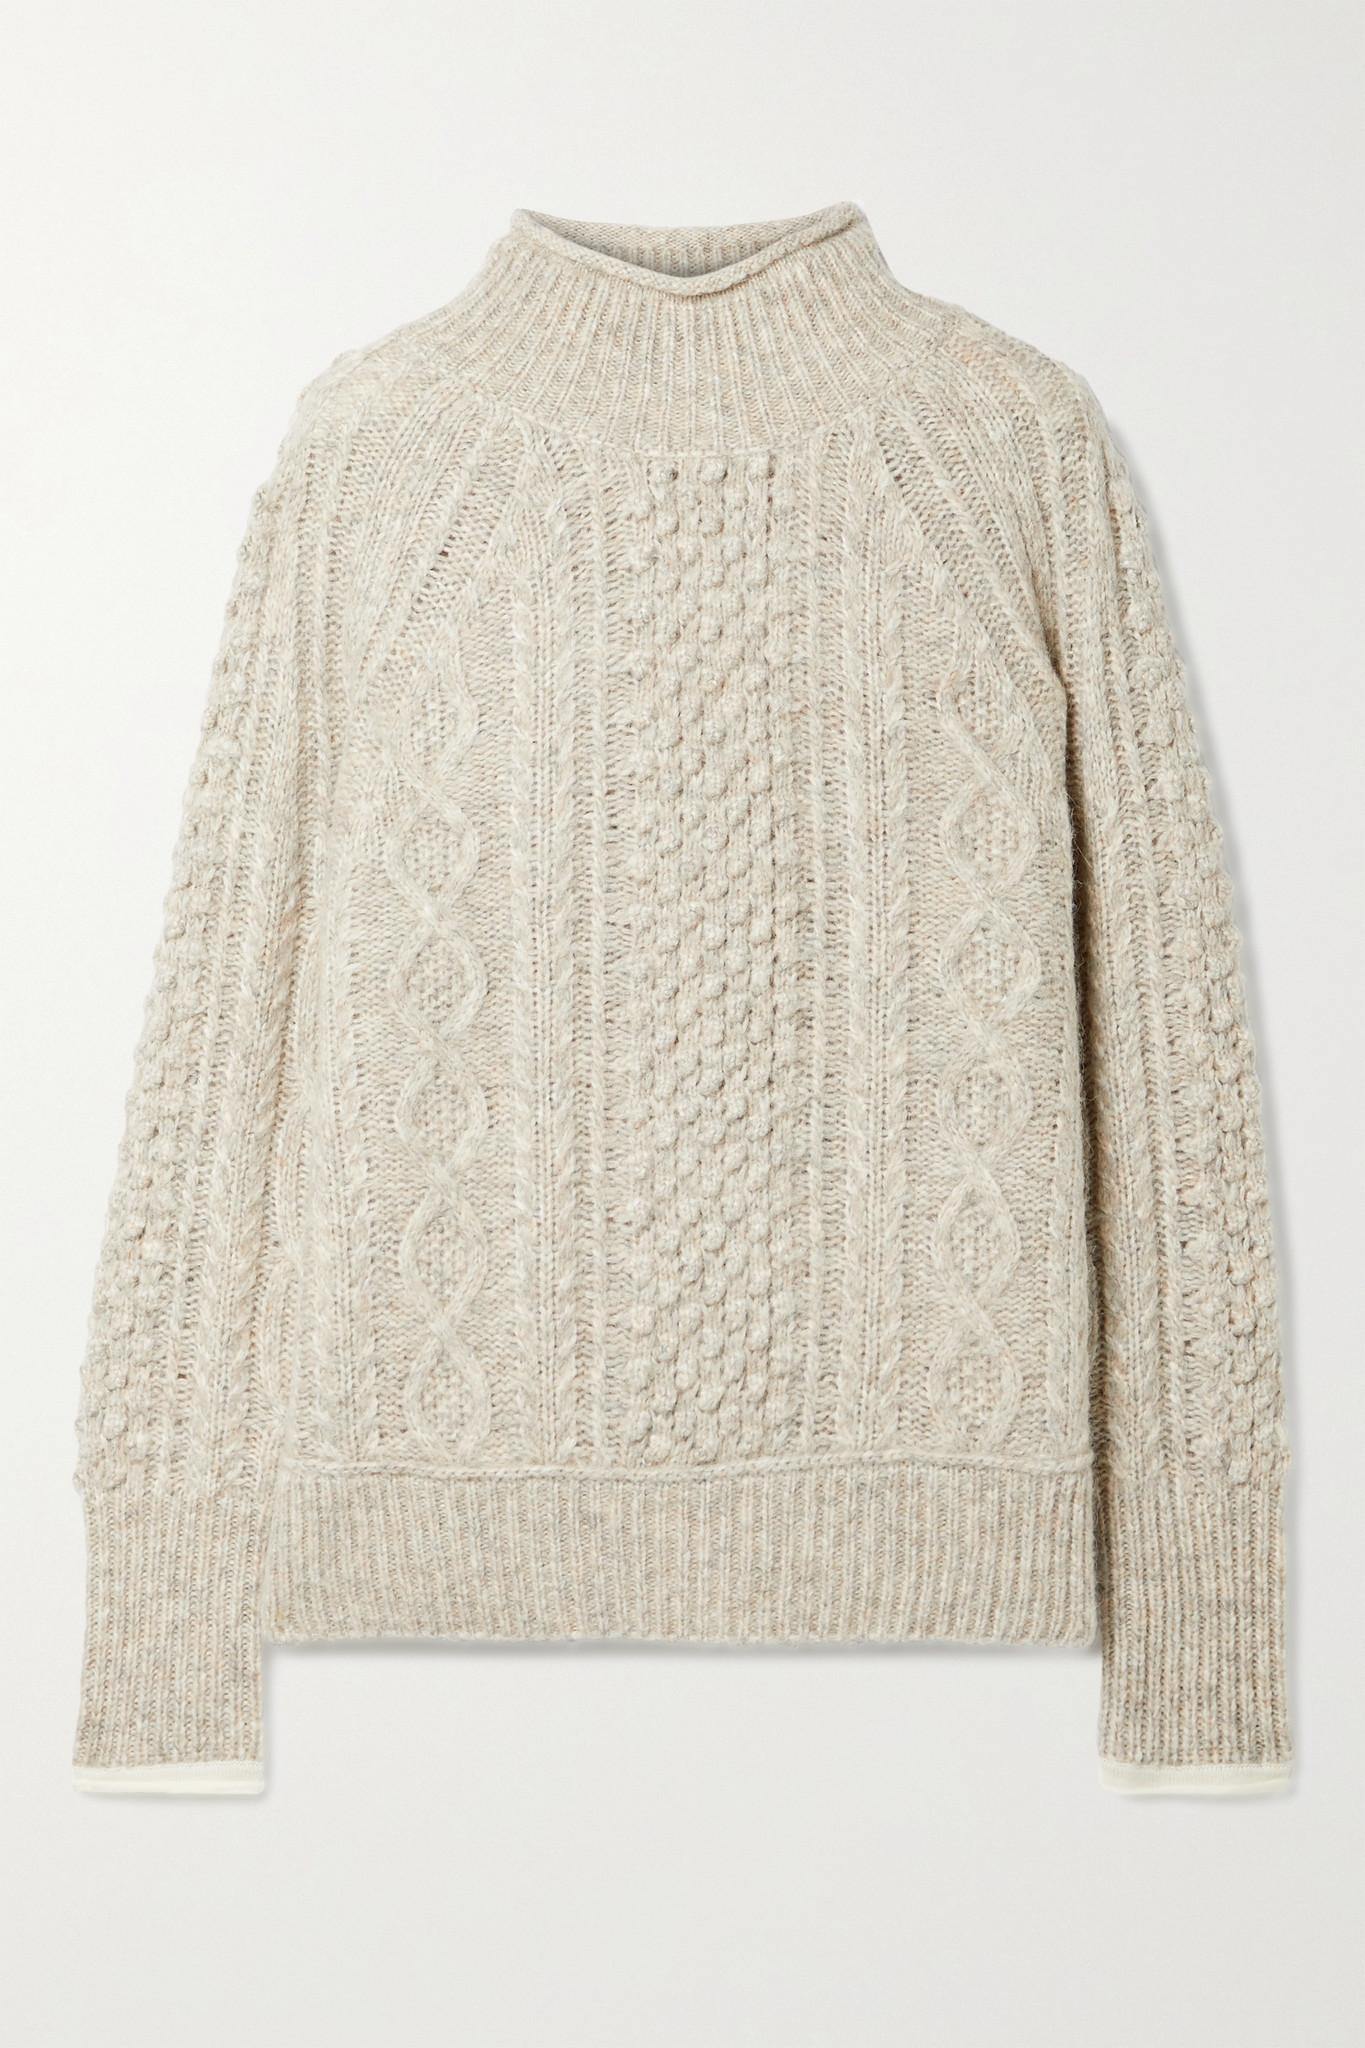 ALEX MILL - Camil 绞花针织混色羊毛混纺毛衣 - 灰色 - medium